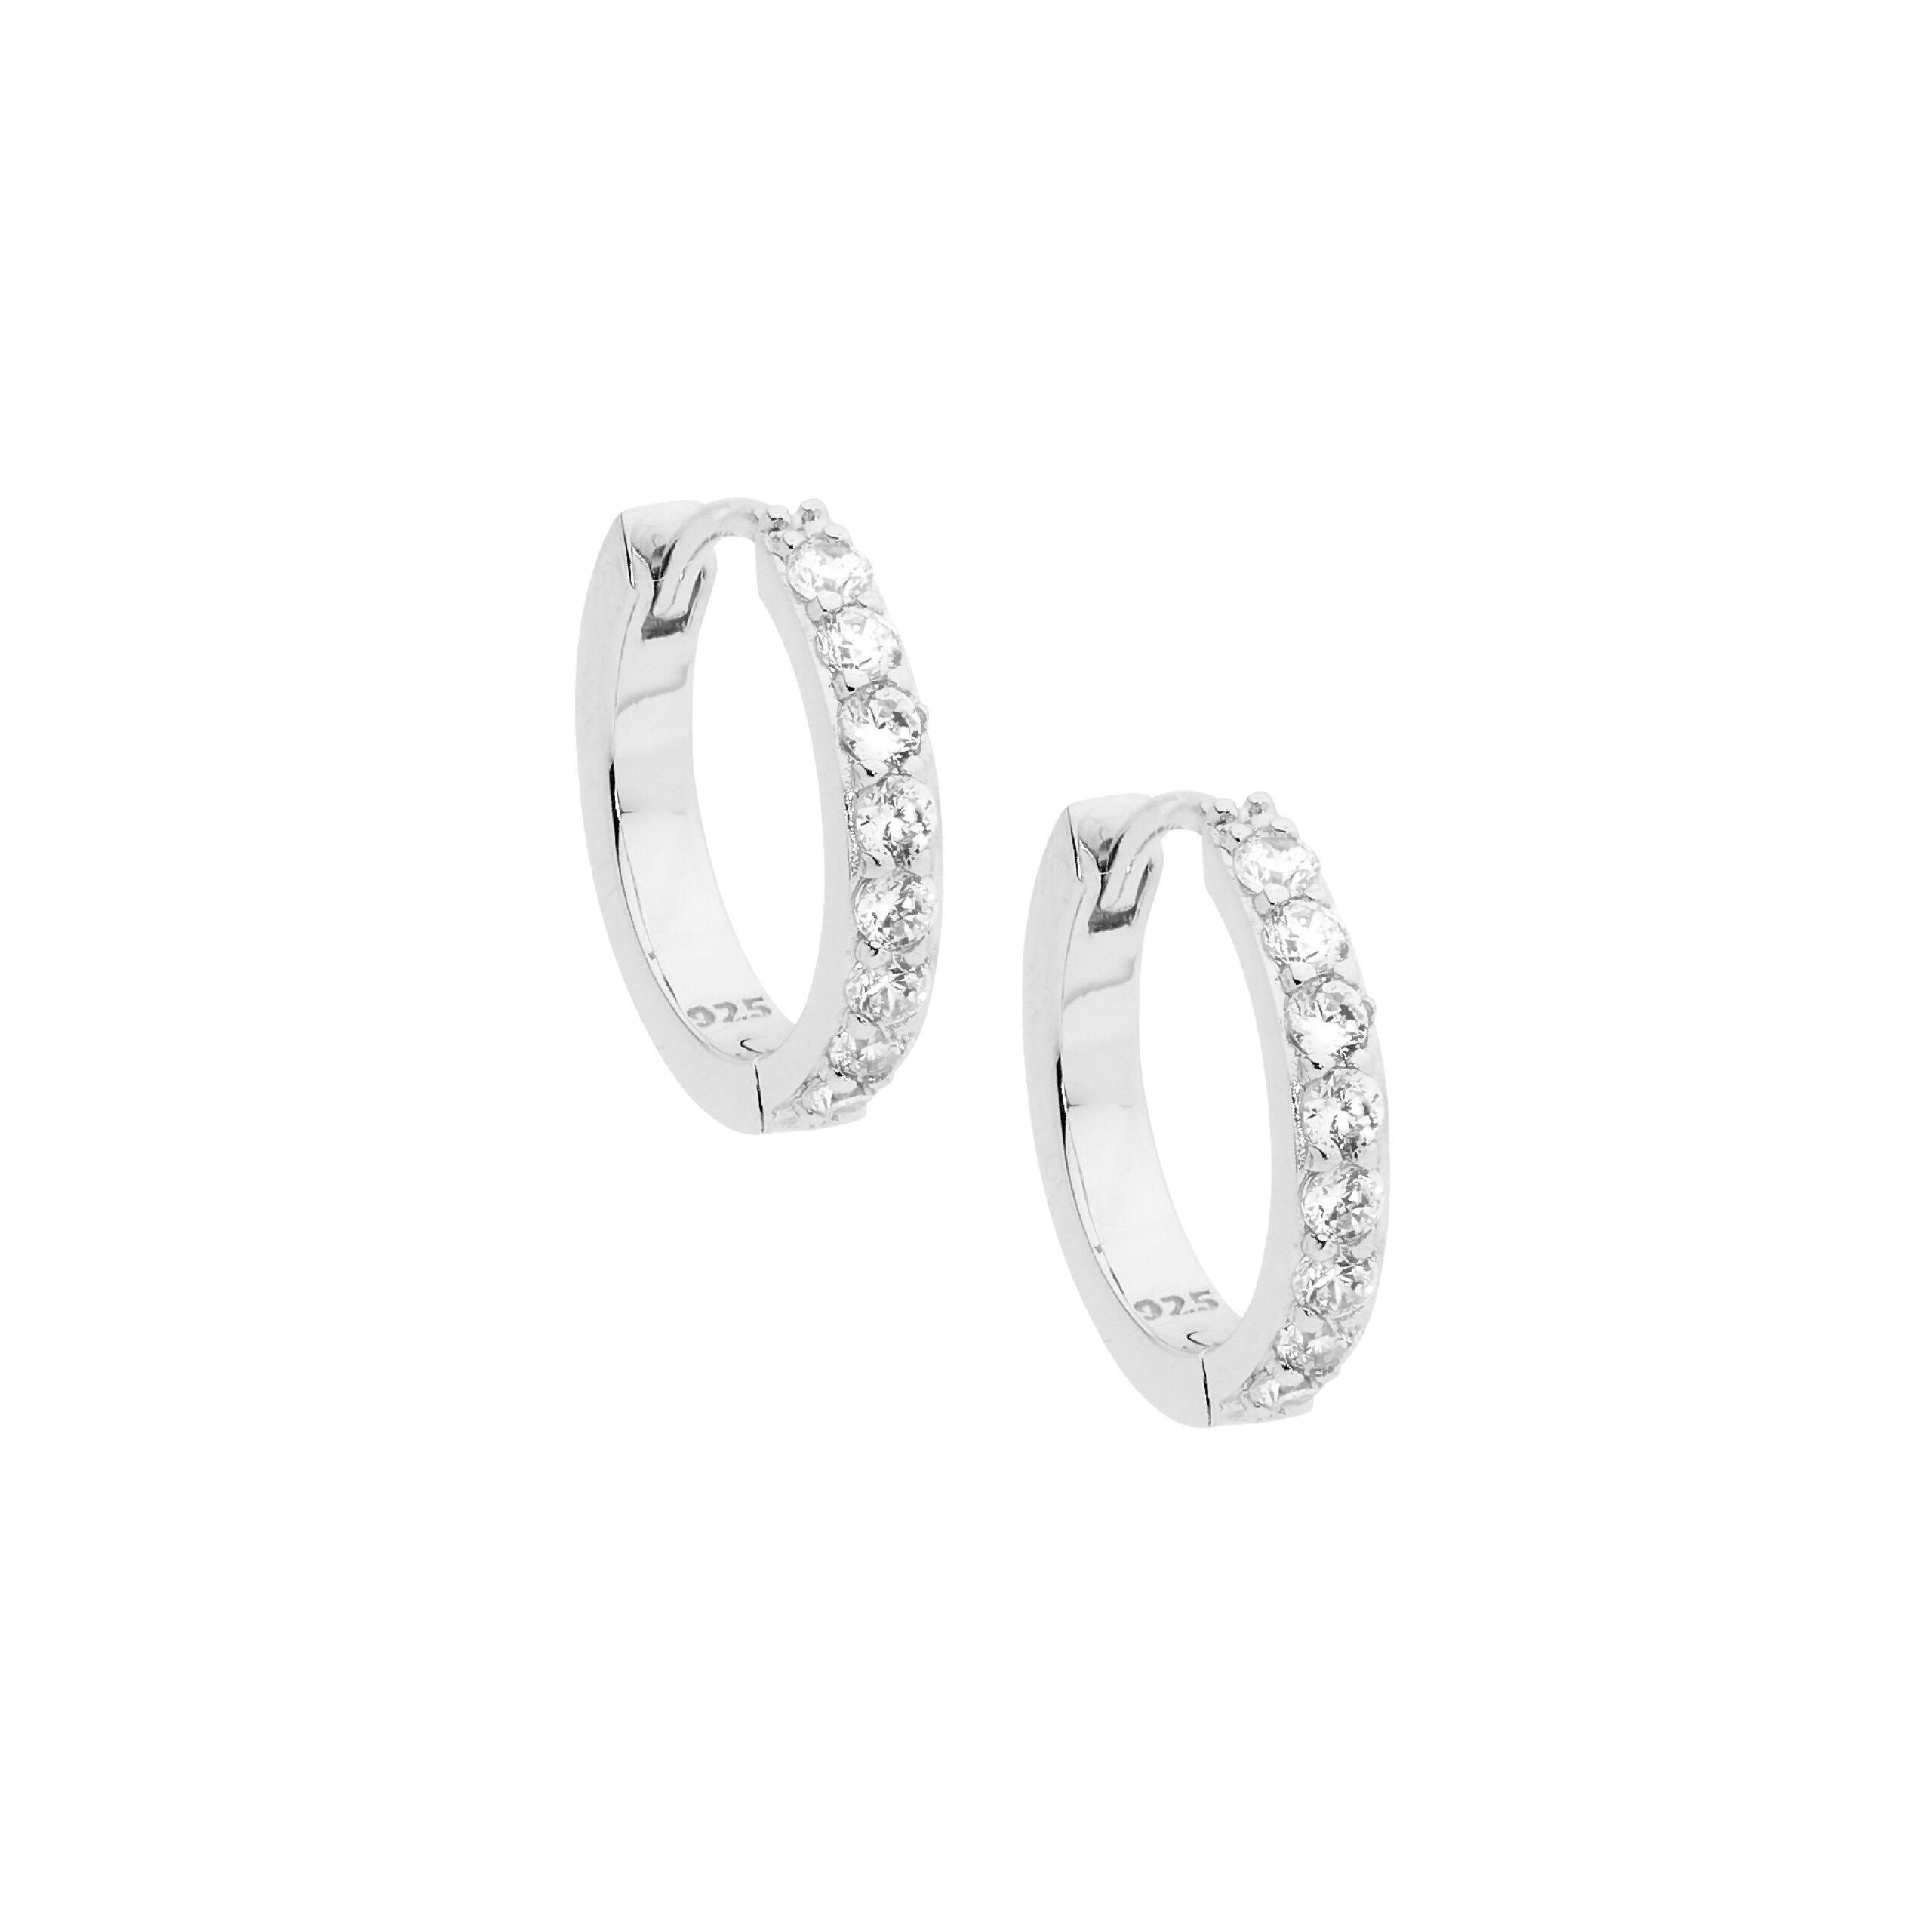 Ellani Sparkling CZ Silver Huggies Earring